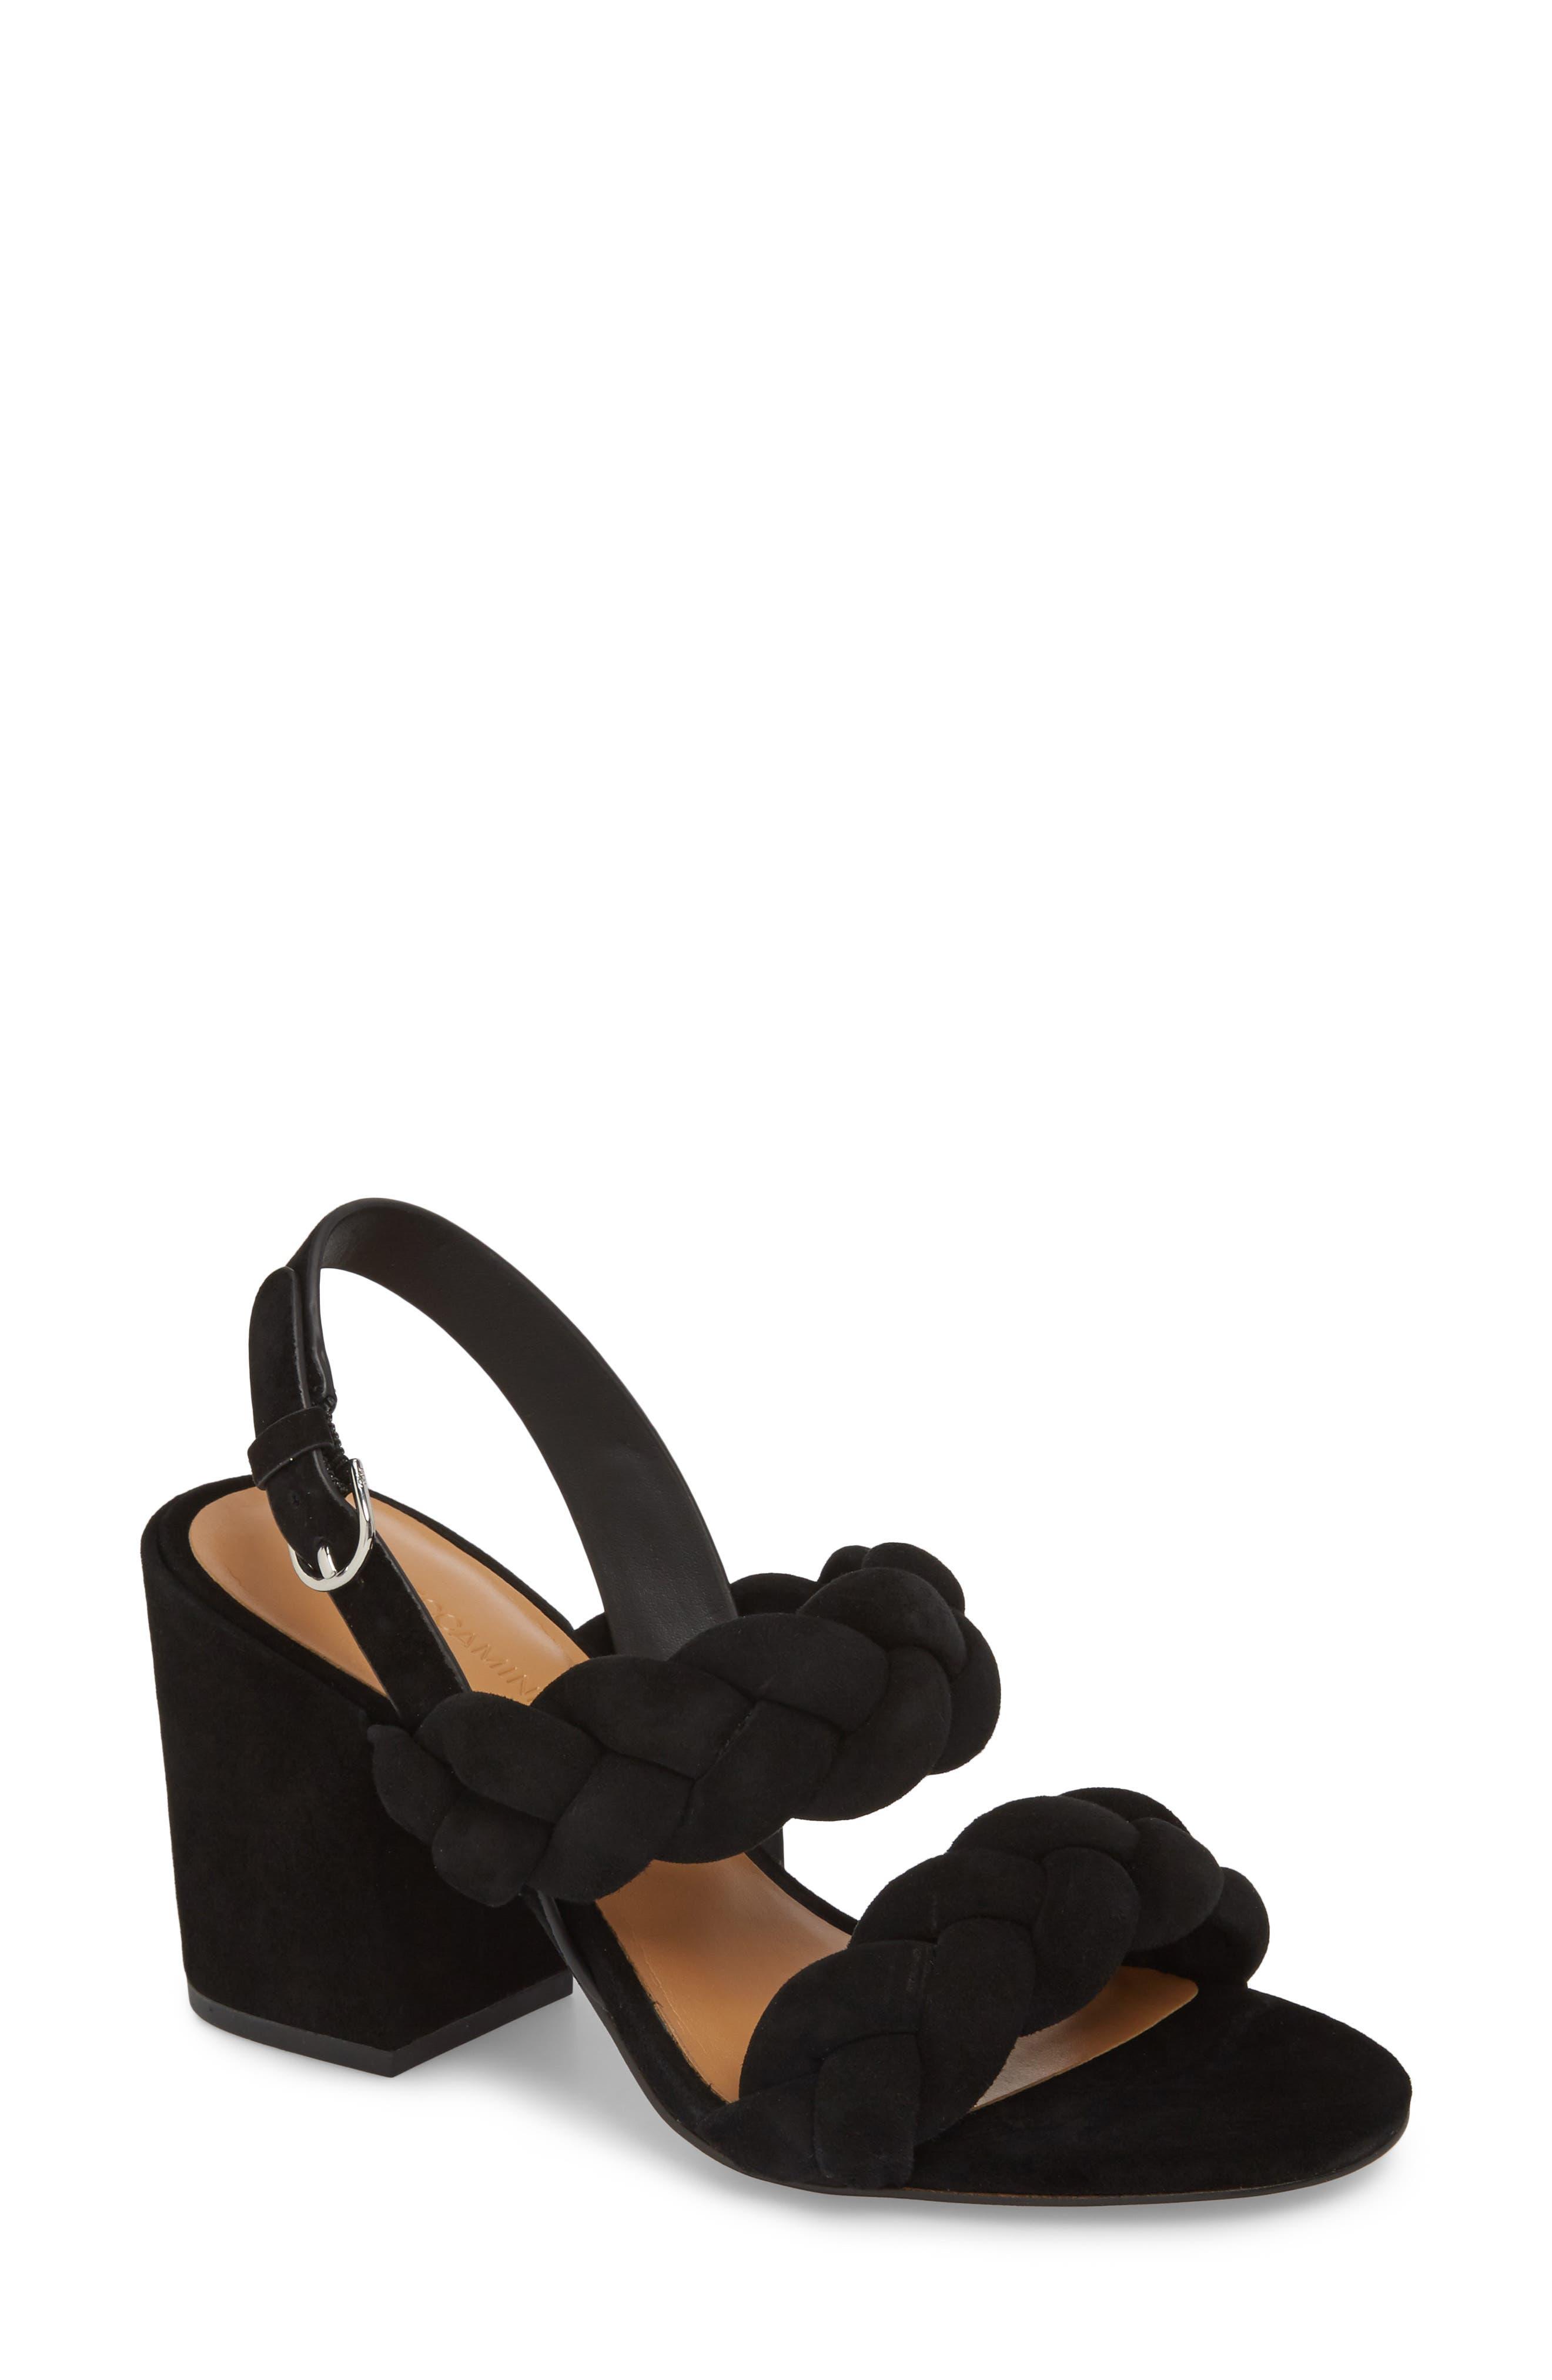 Candance Block Heel Sandal, Main, color, BLACK LEATHER